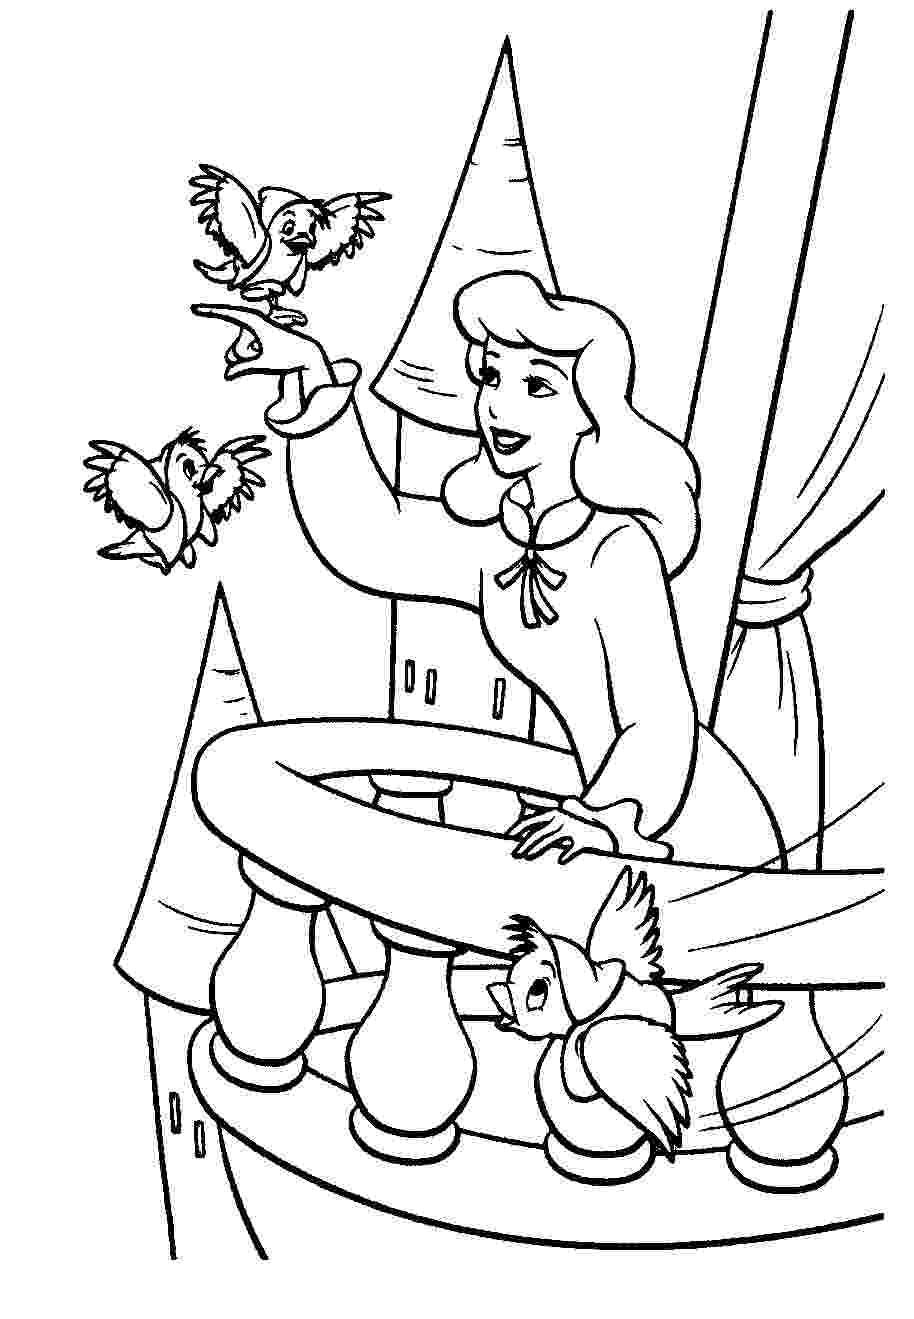 cinderella coloring pages free free printable cinderella activity sheets and coloring coloring pages free cinderella